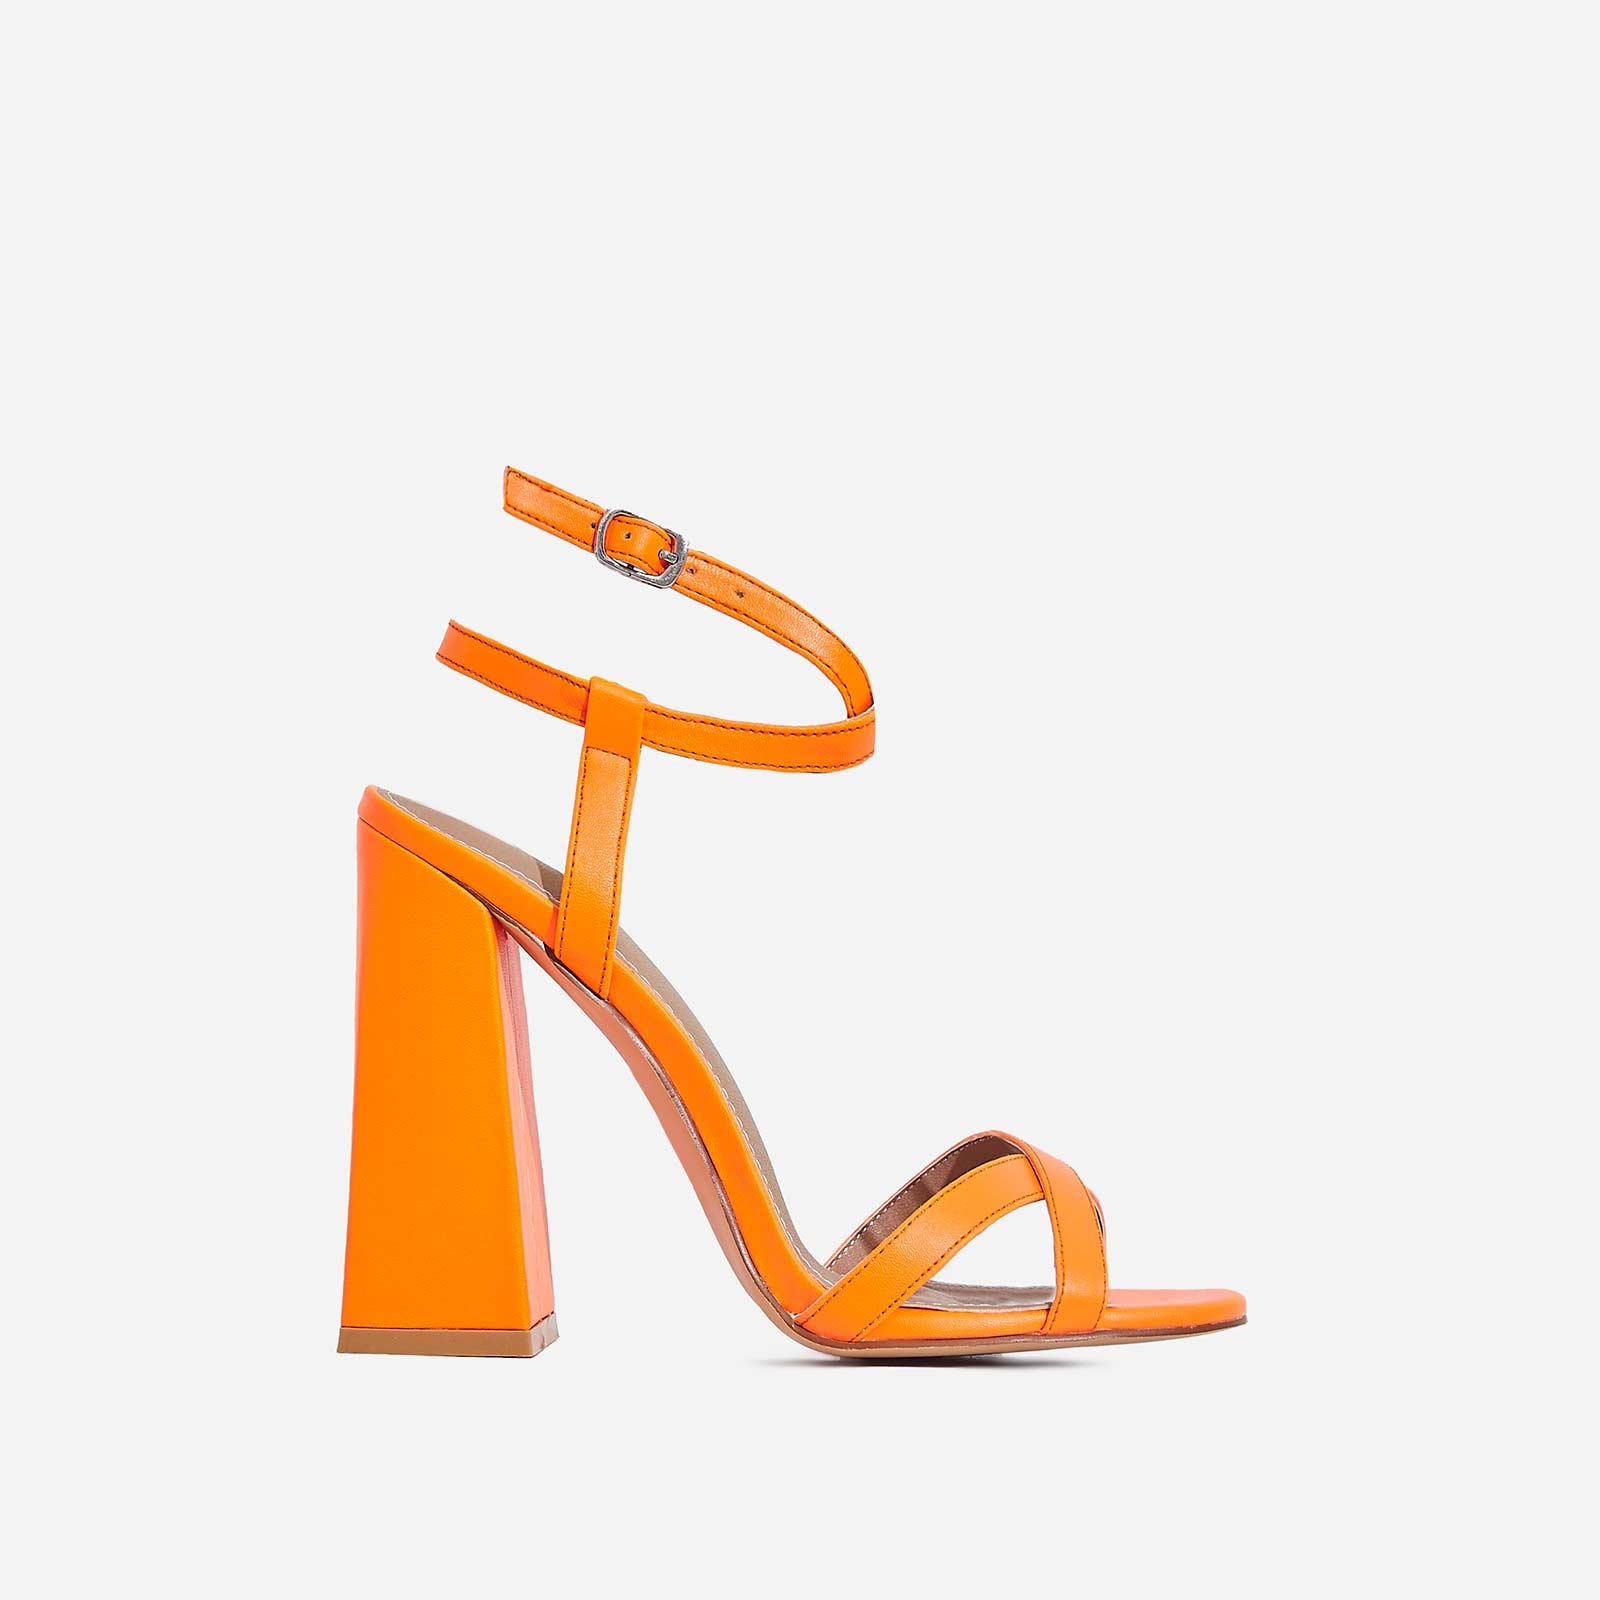 6b7fc1a6923 Iris Flared Block Heel In Neon Orange Faux Leather